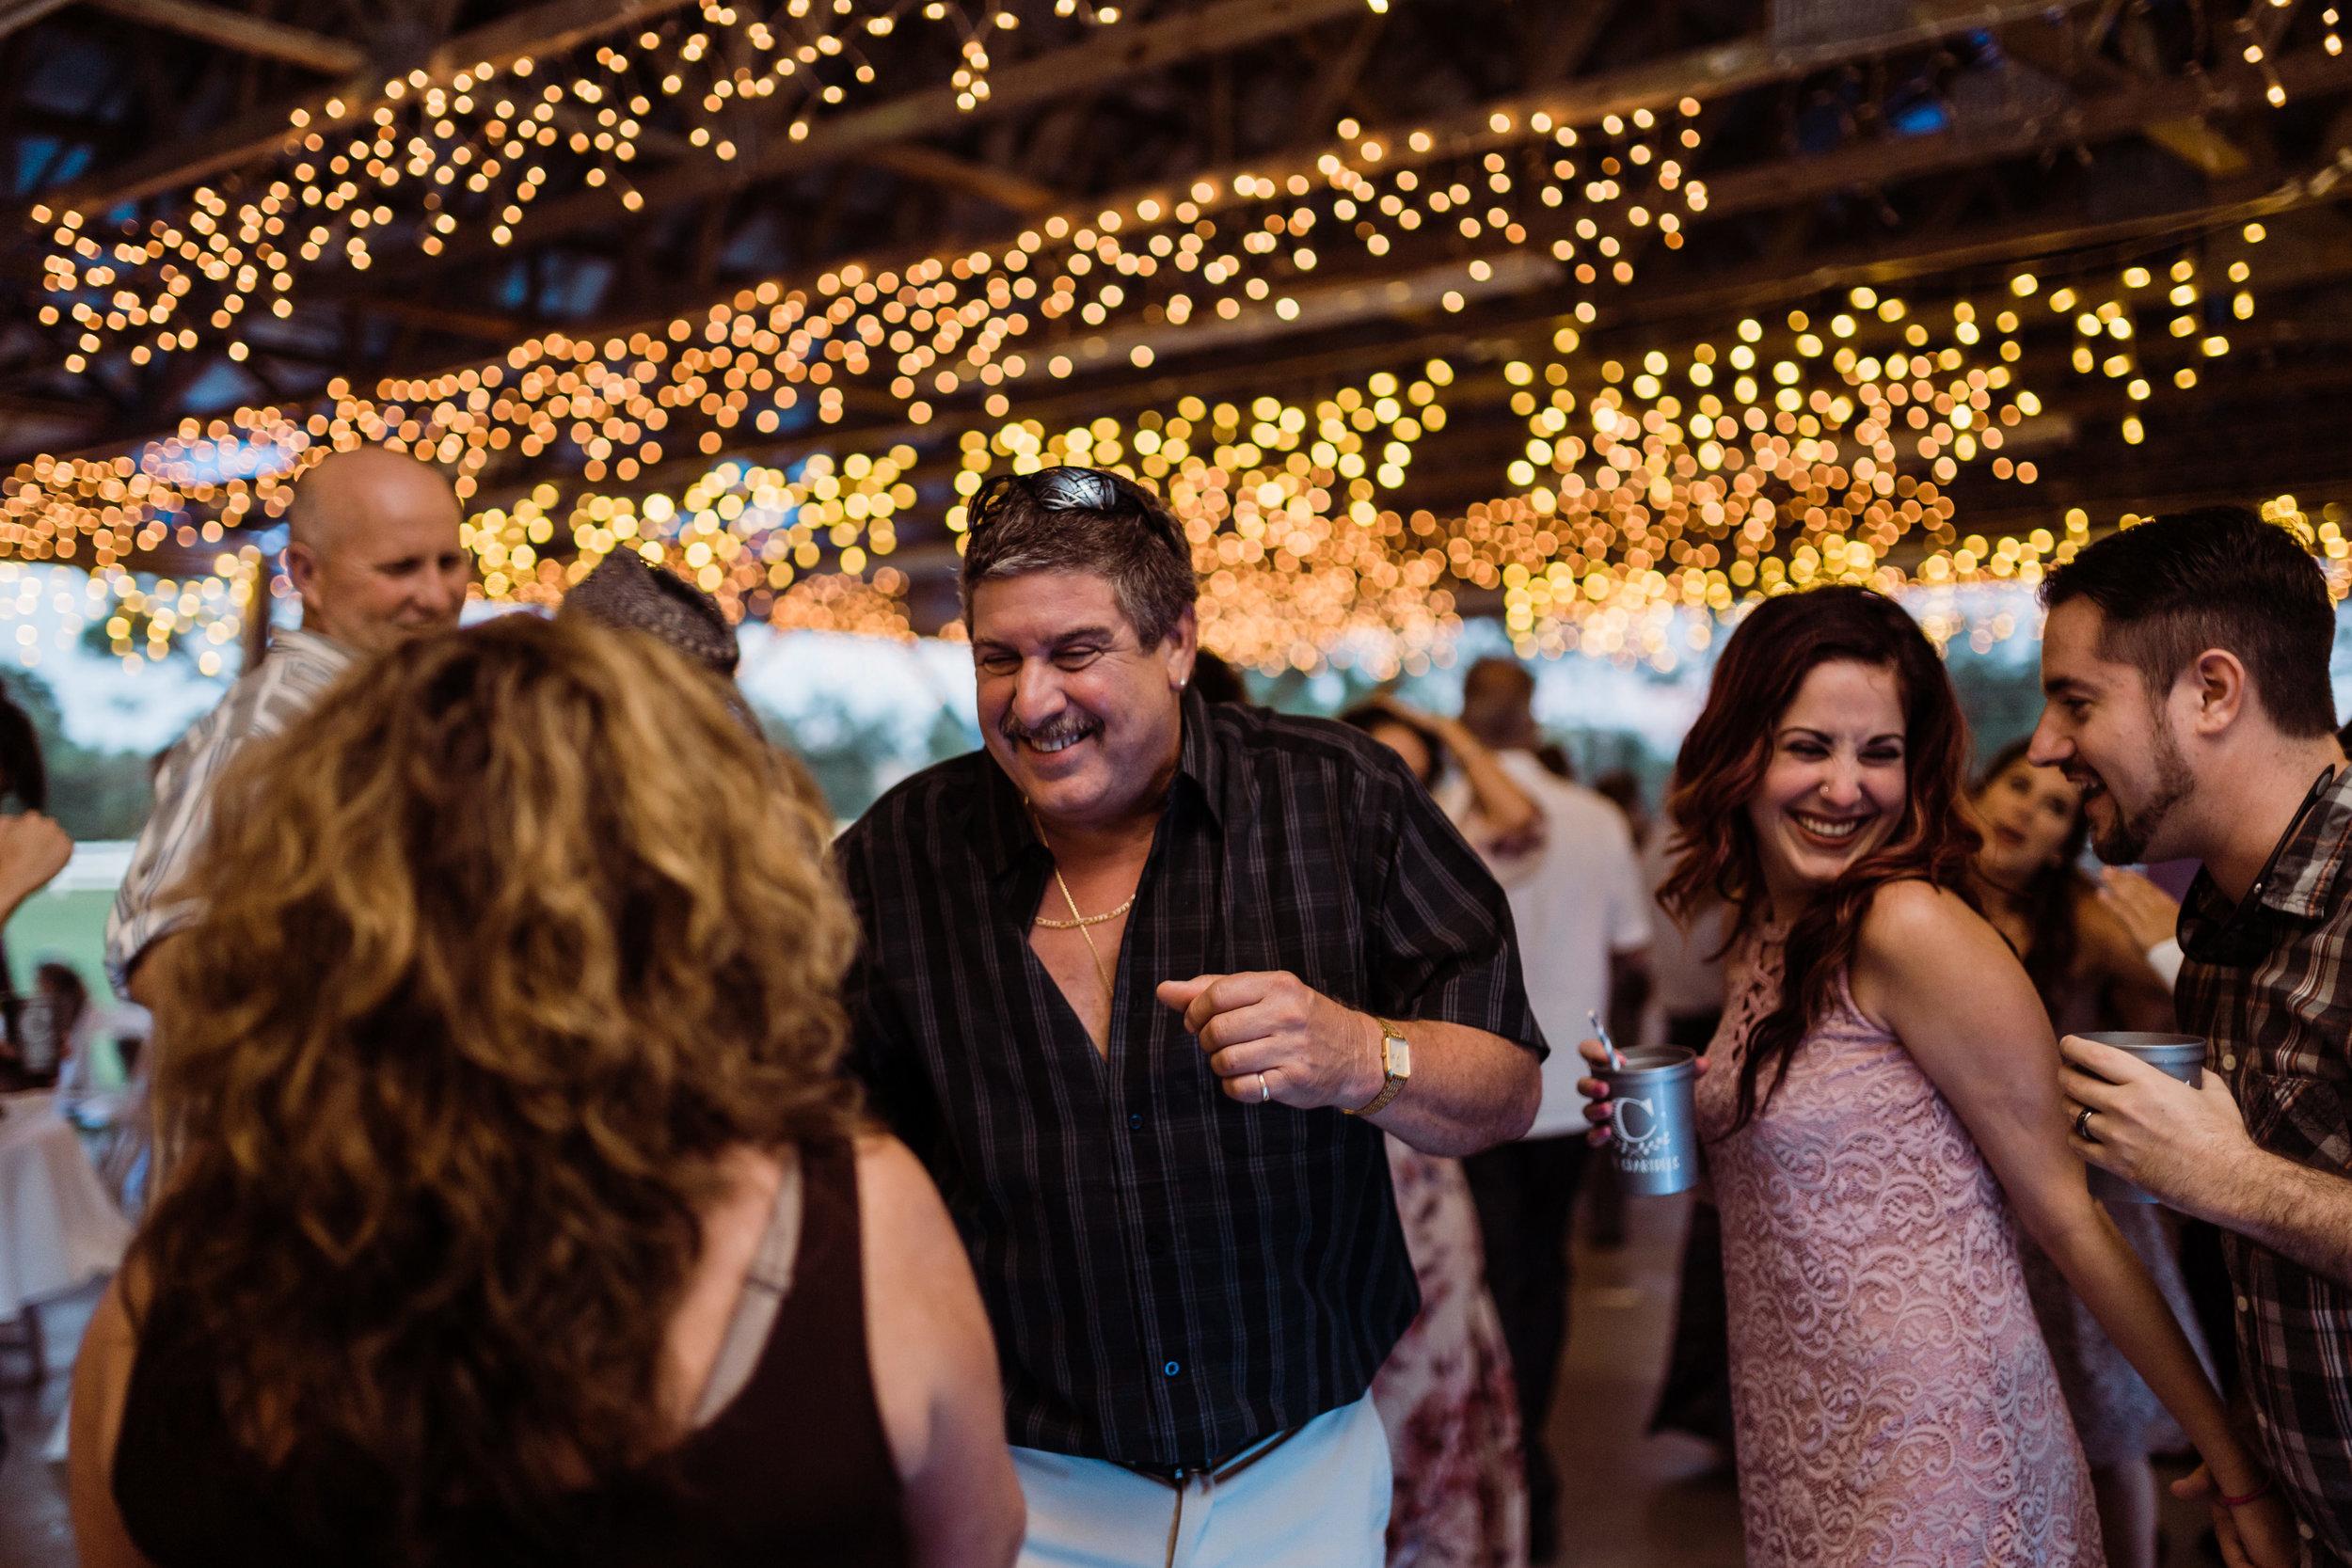 2017.10.14 Samantha and Matthew Crabtree Sarasota Wedding (558 of 708).jpg